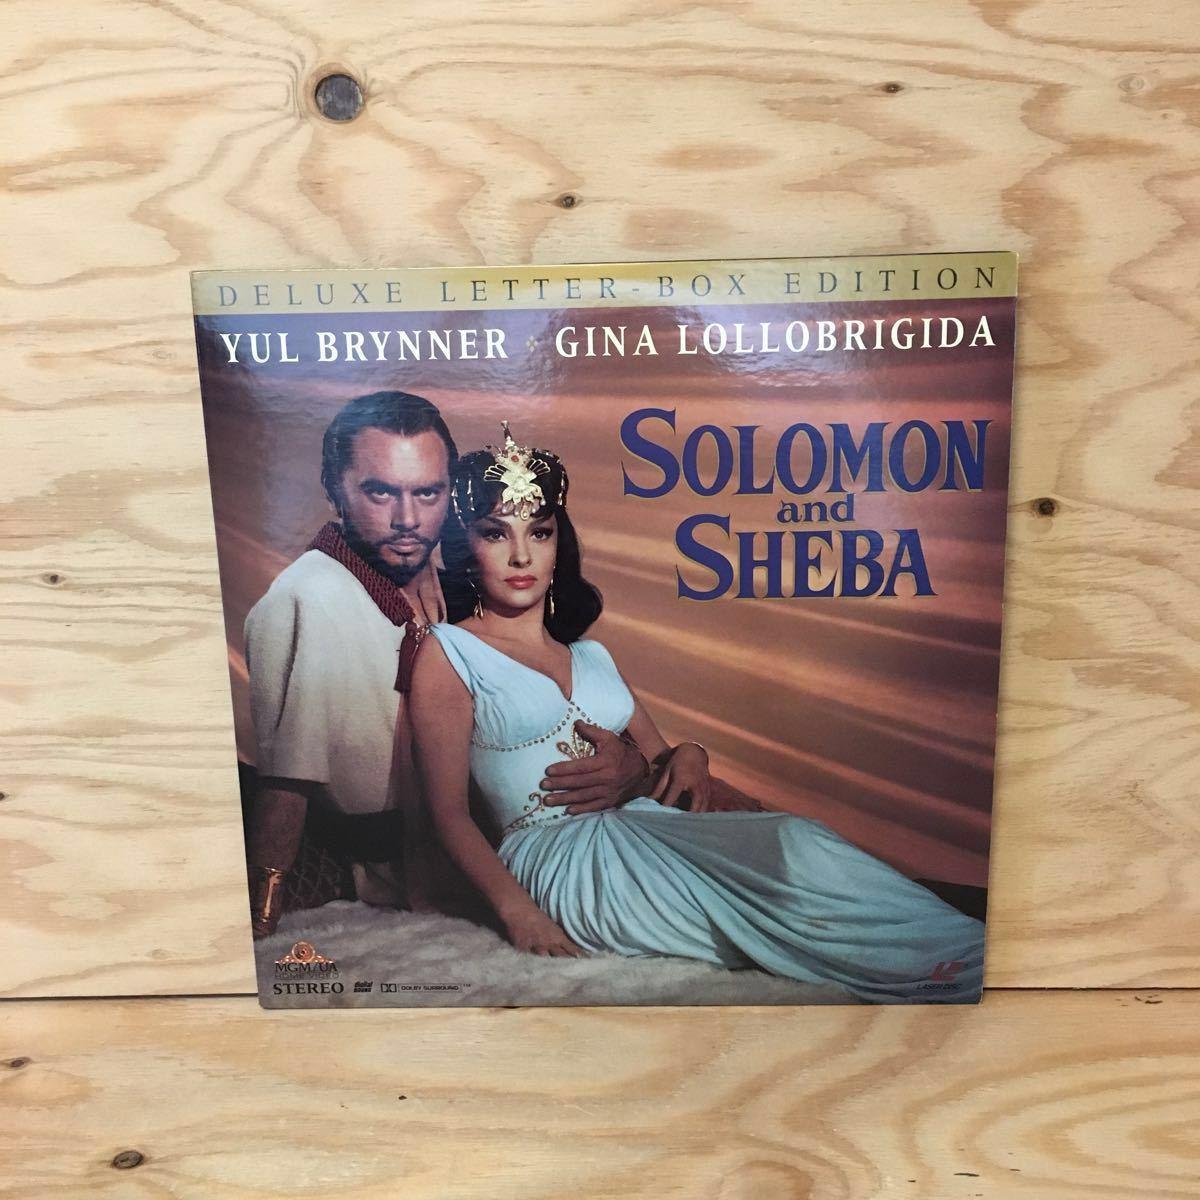 ◎Y3FIIC-200302 レア[SOLOMON and SHEBA 輸入盤]LD レーザーディスク YUL BRYNNER KING VIDOR_画像1